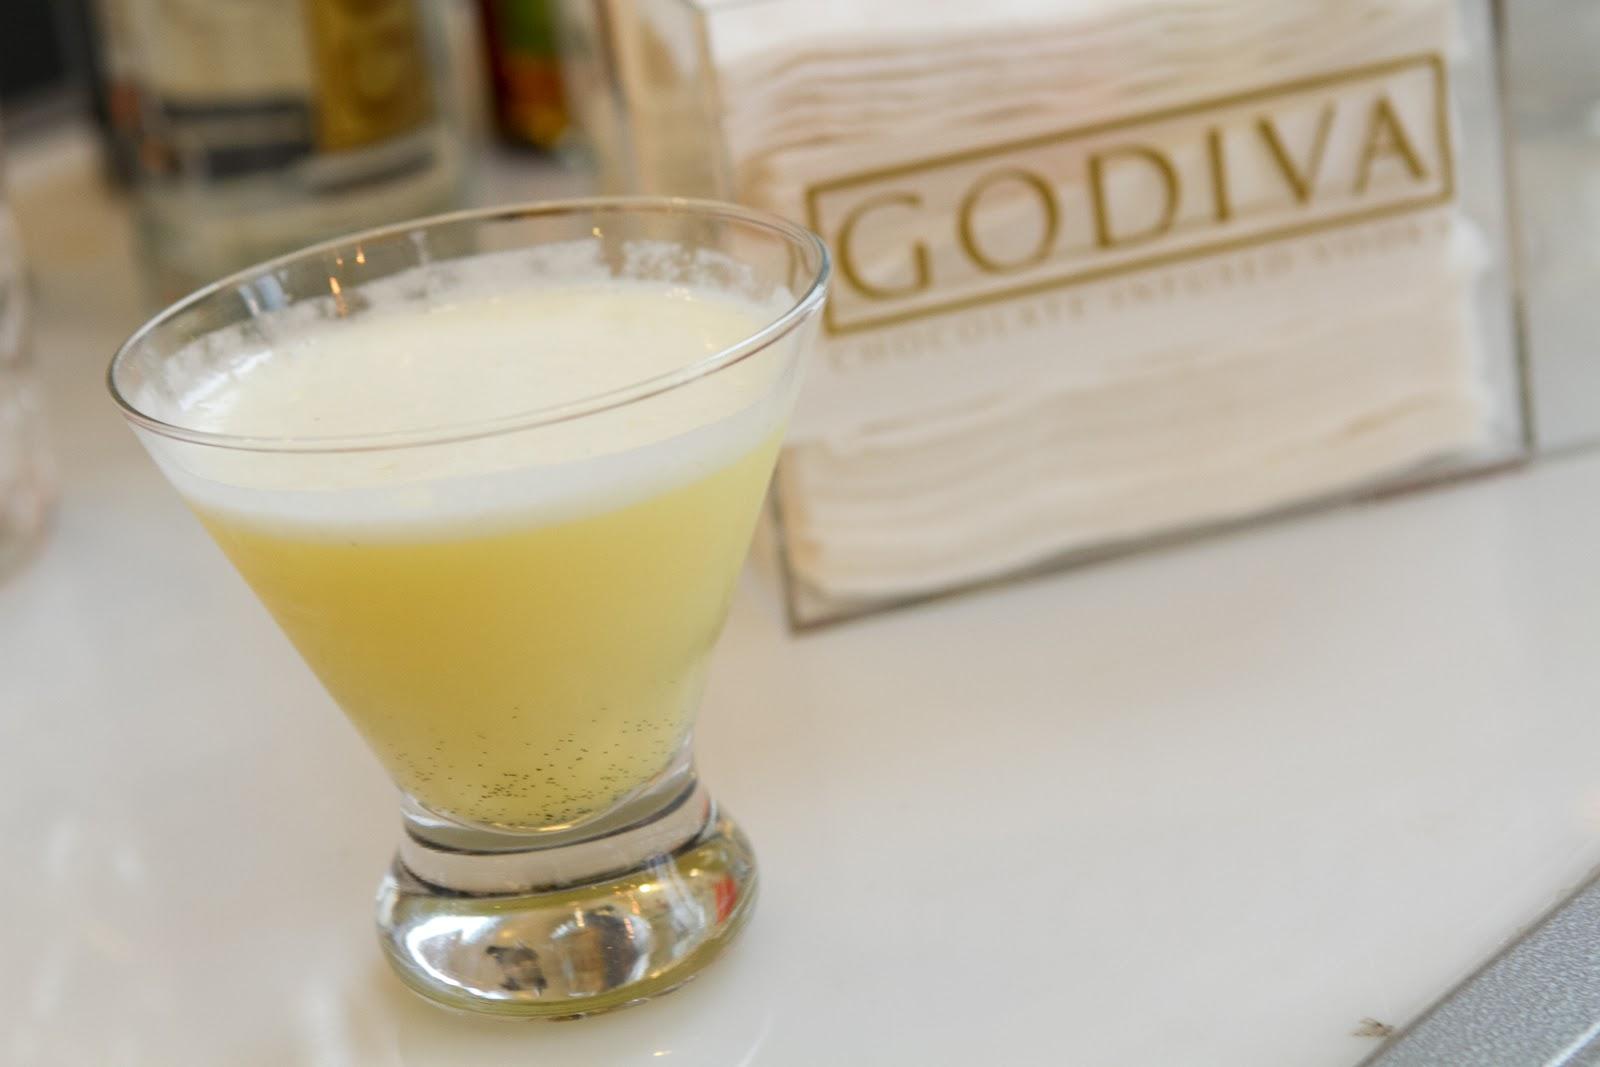 missa the staycation mama diy mixology godiva cocktail